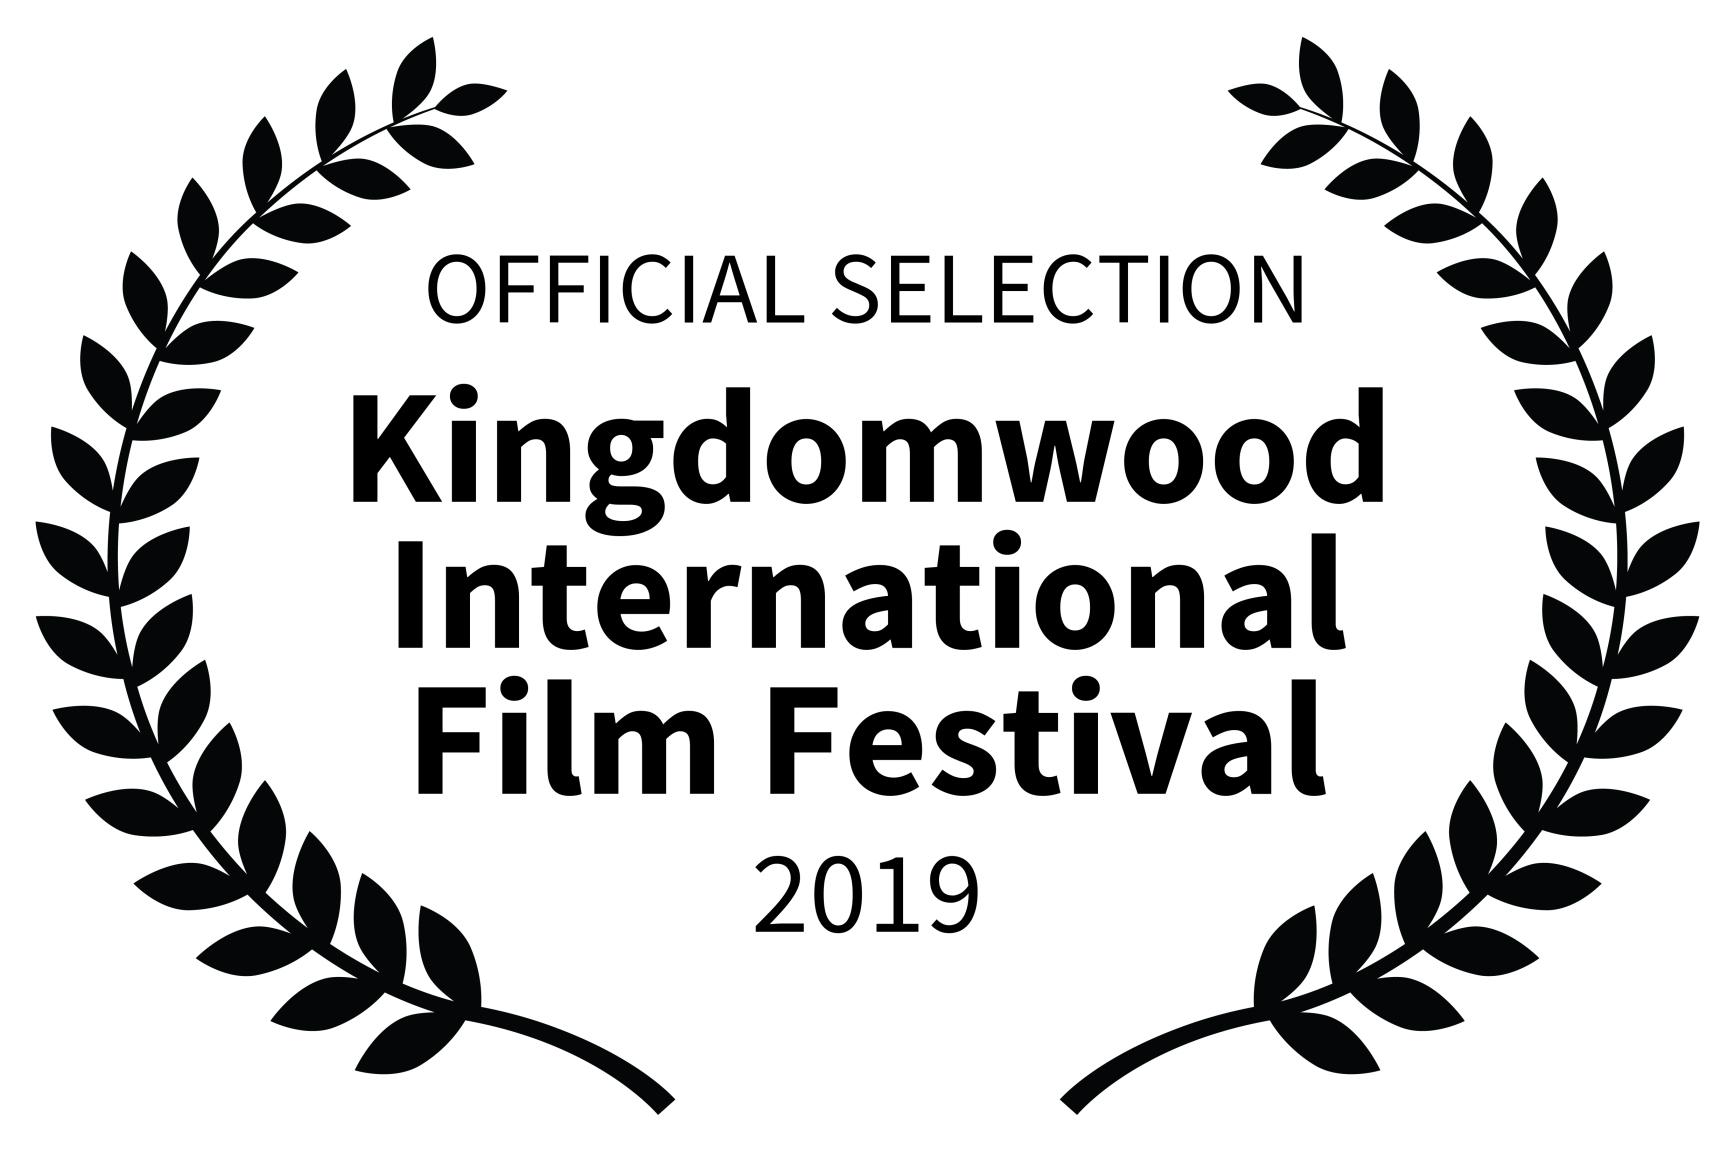 Kingdom OFFICIAL SELECTION - Kingdomwood International Film Festival - 2019 (2) copy.jpg